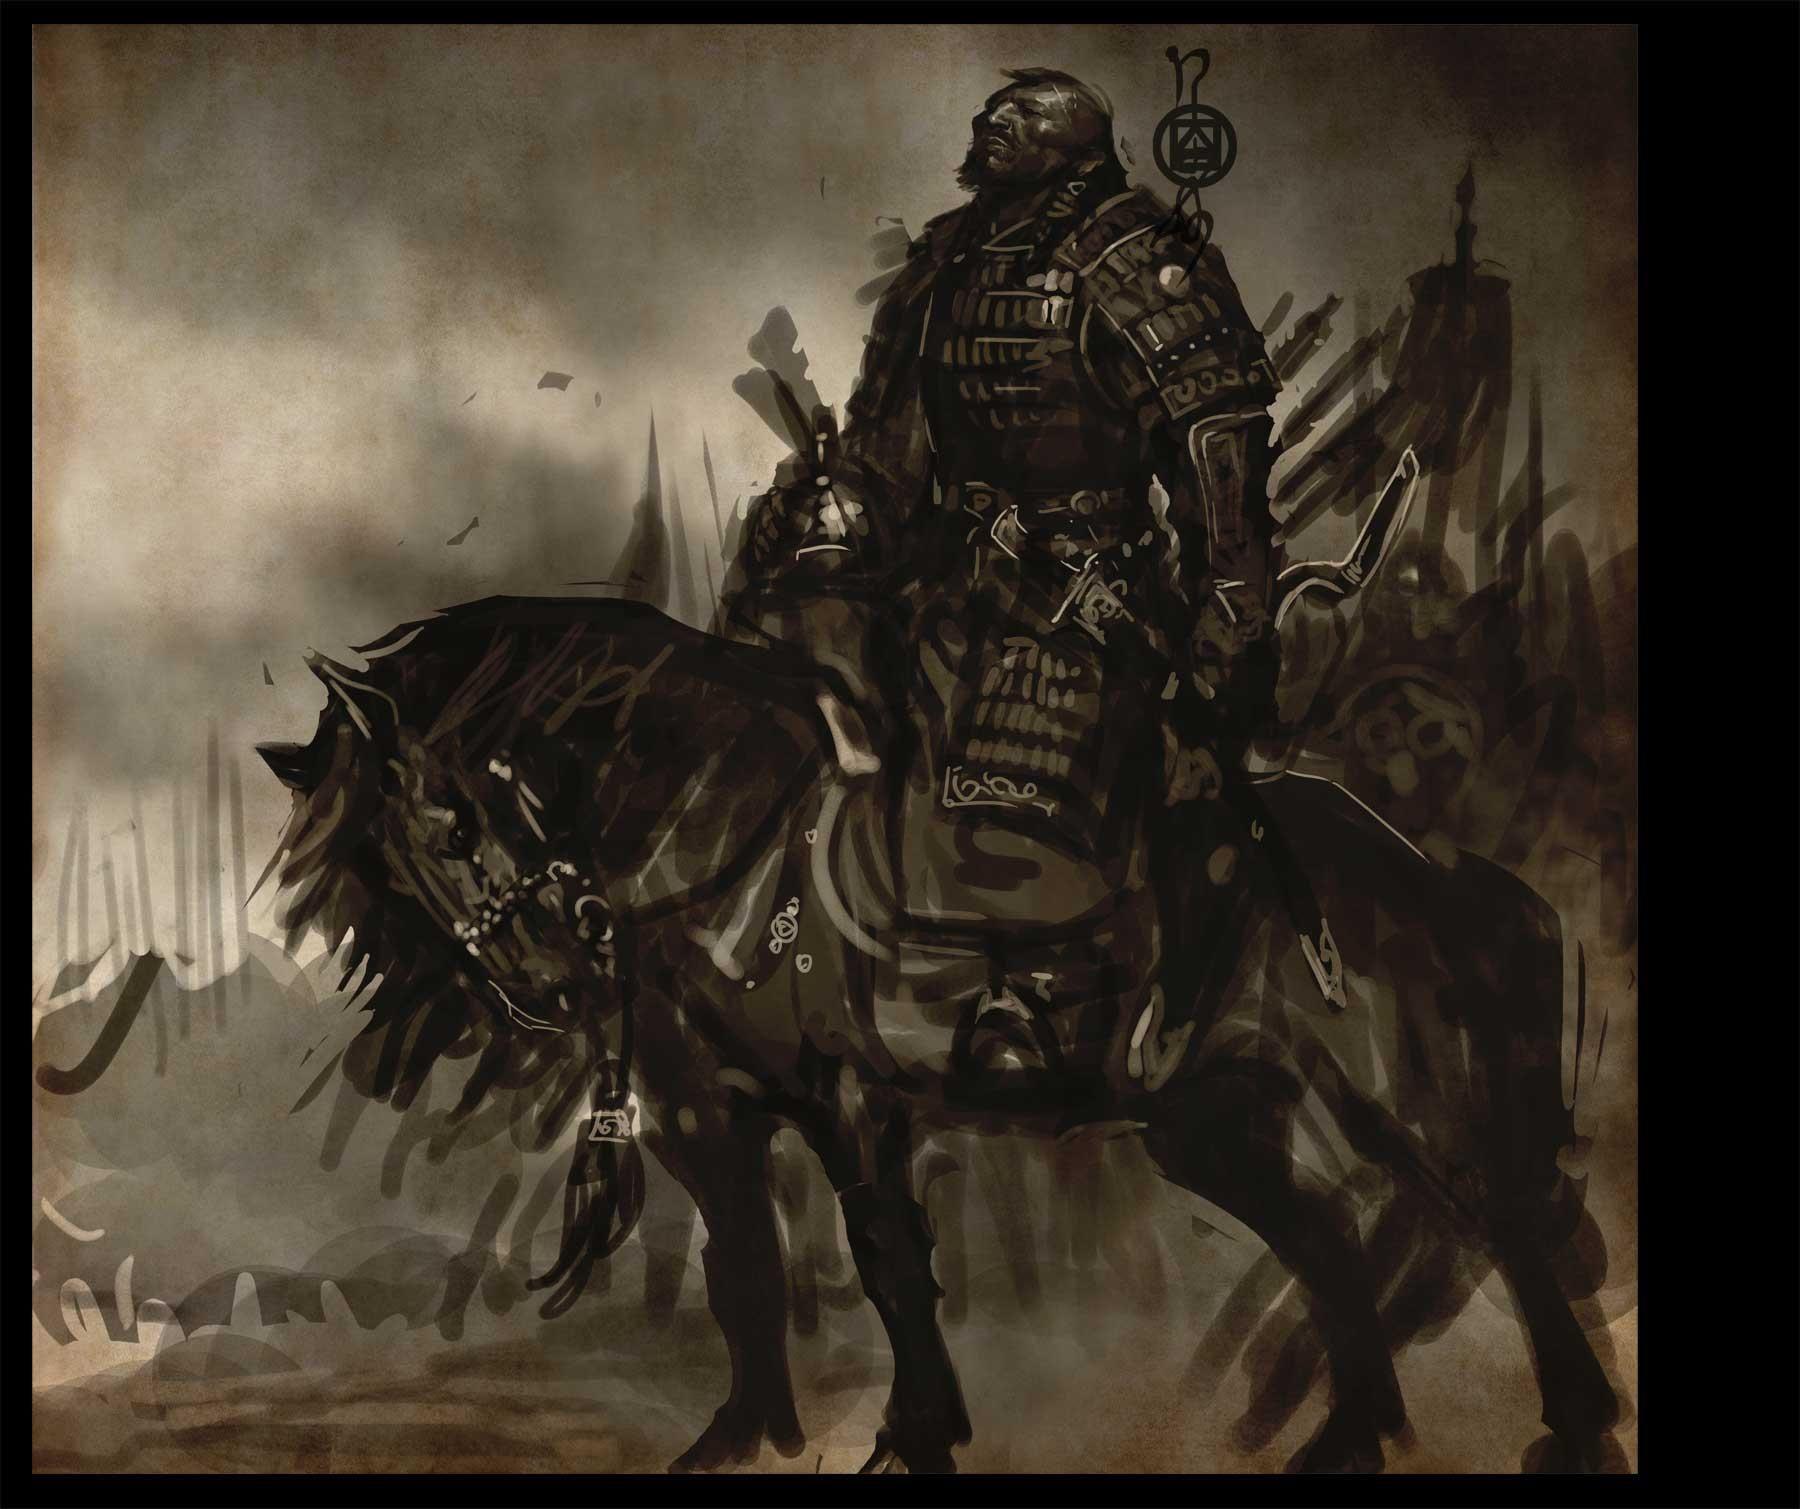 Николай картинки, картинки воинов кочевников